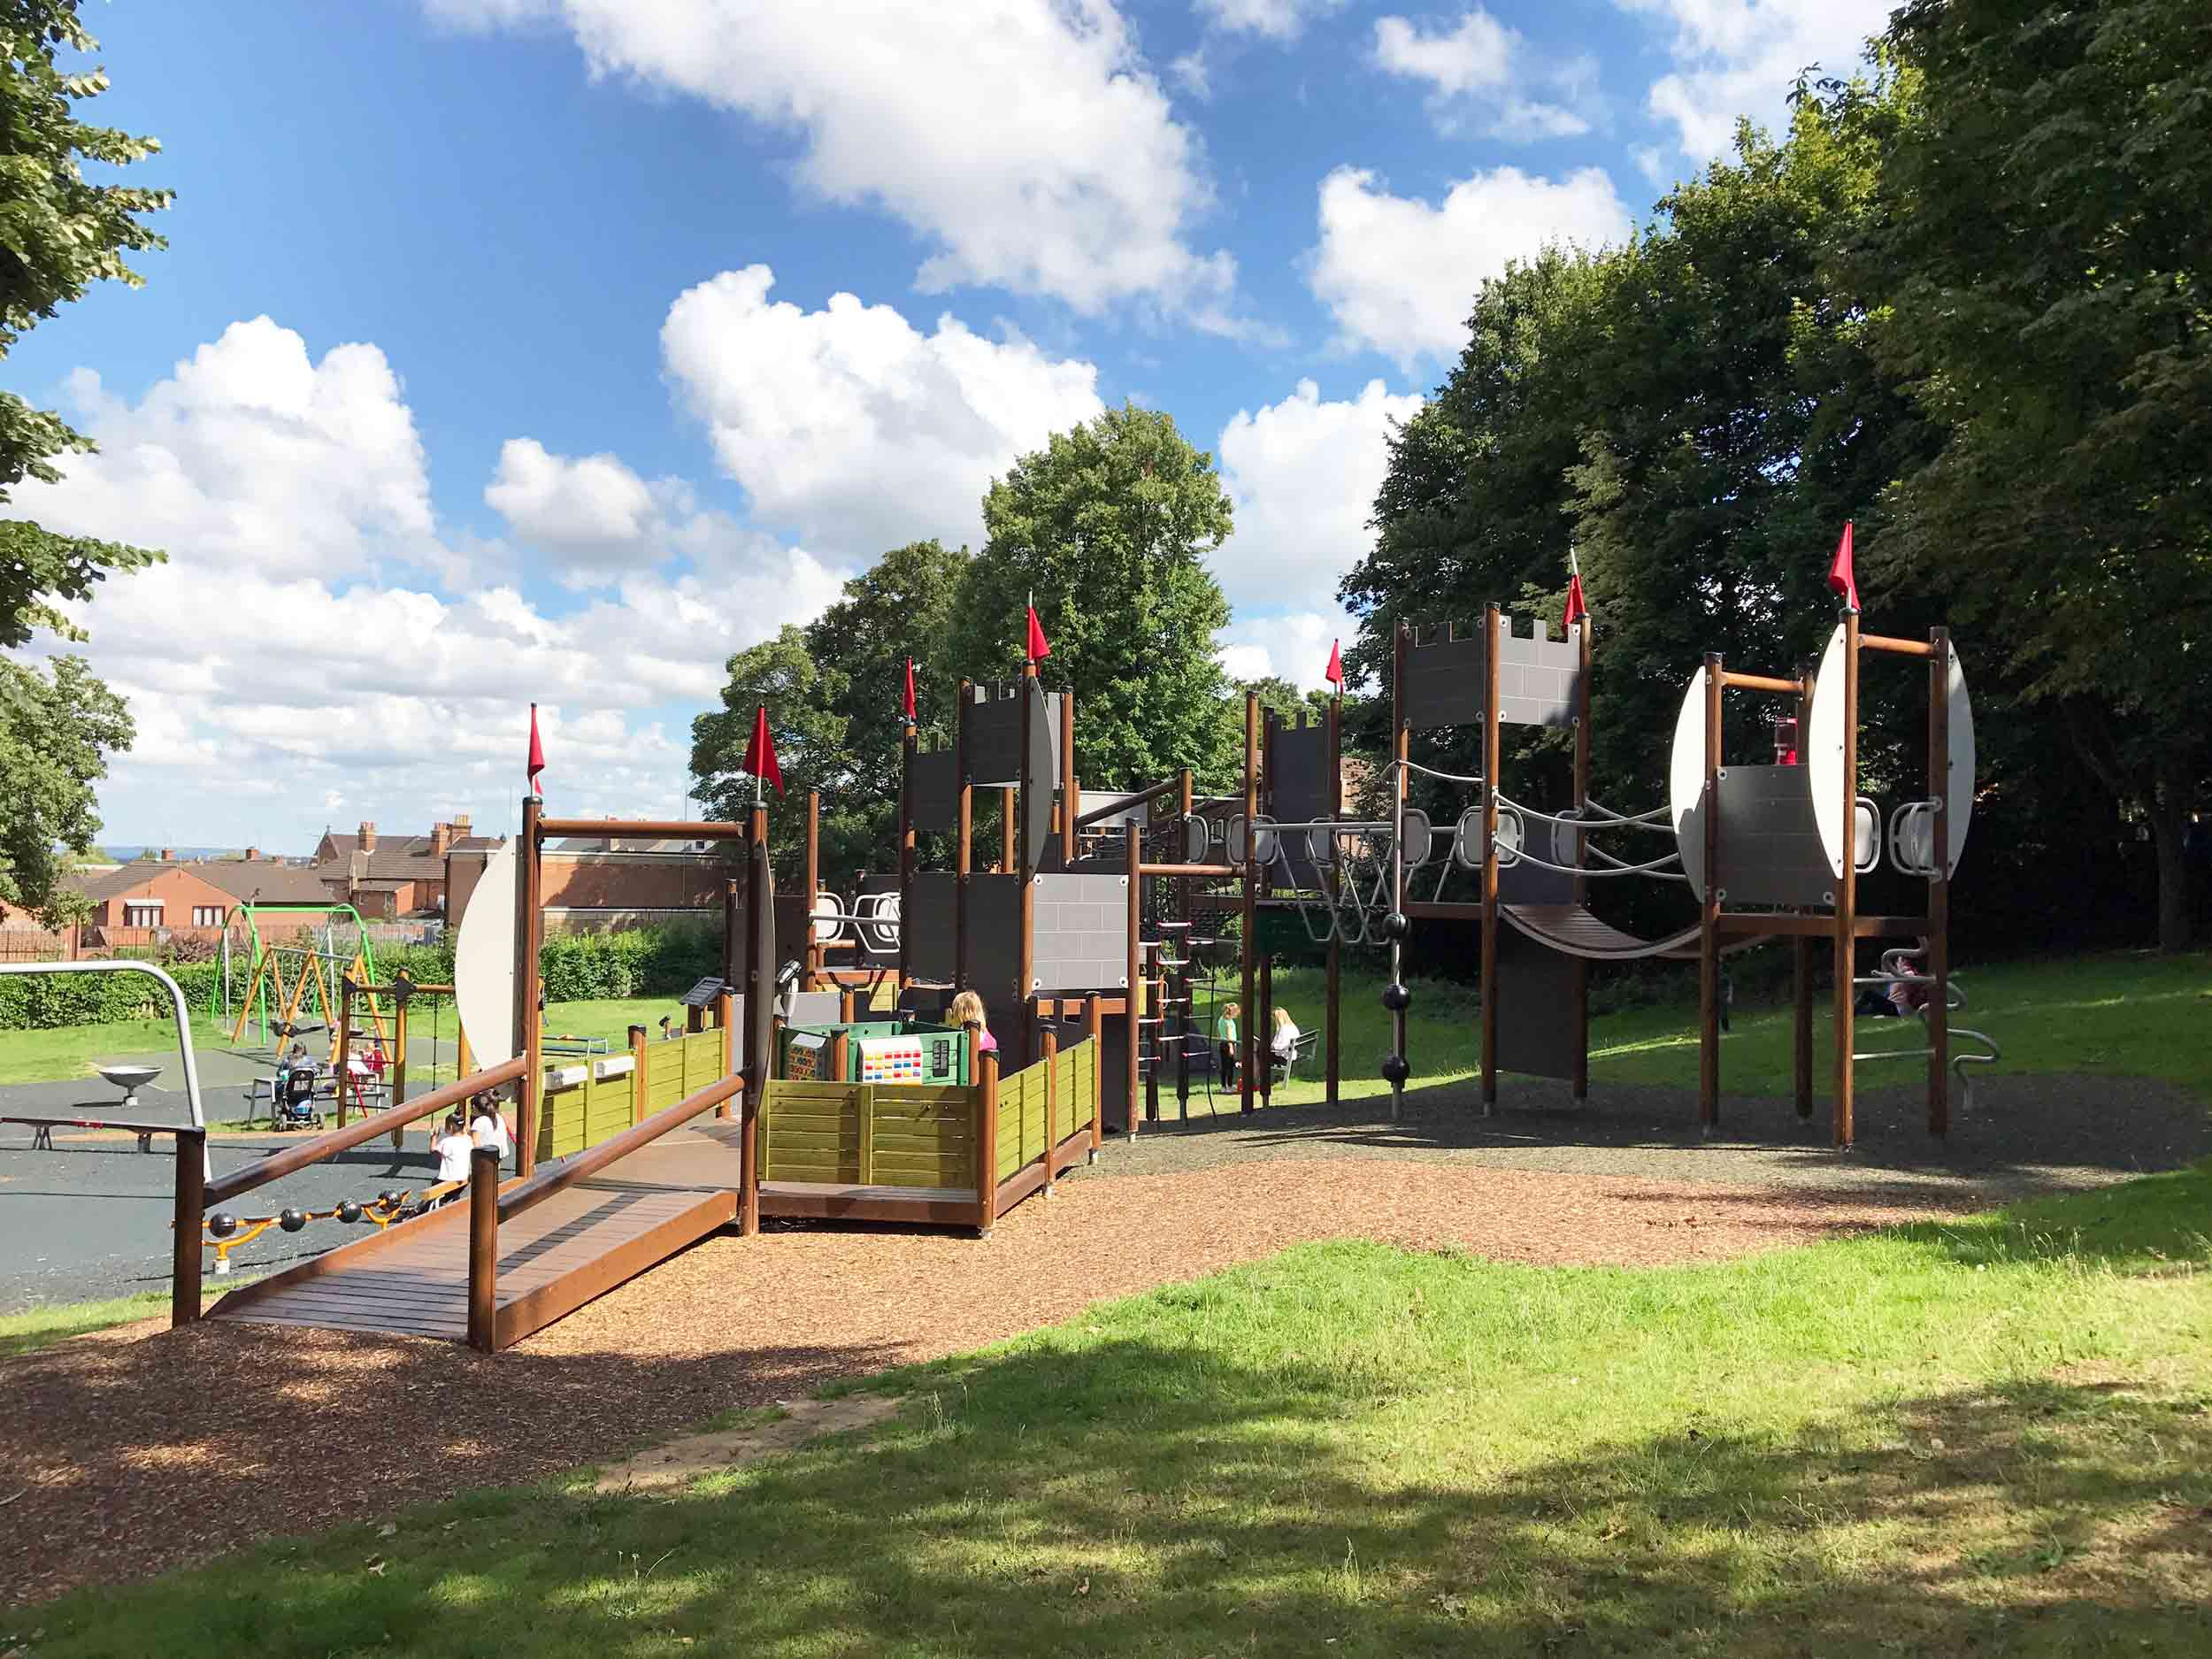 Amazing Municipal Gardens And Play Area, Aldershot, Hampshire